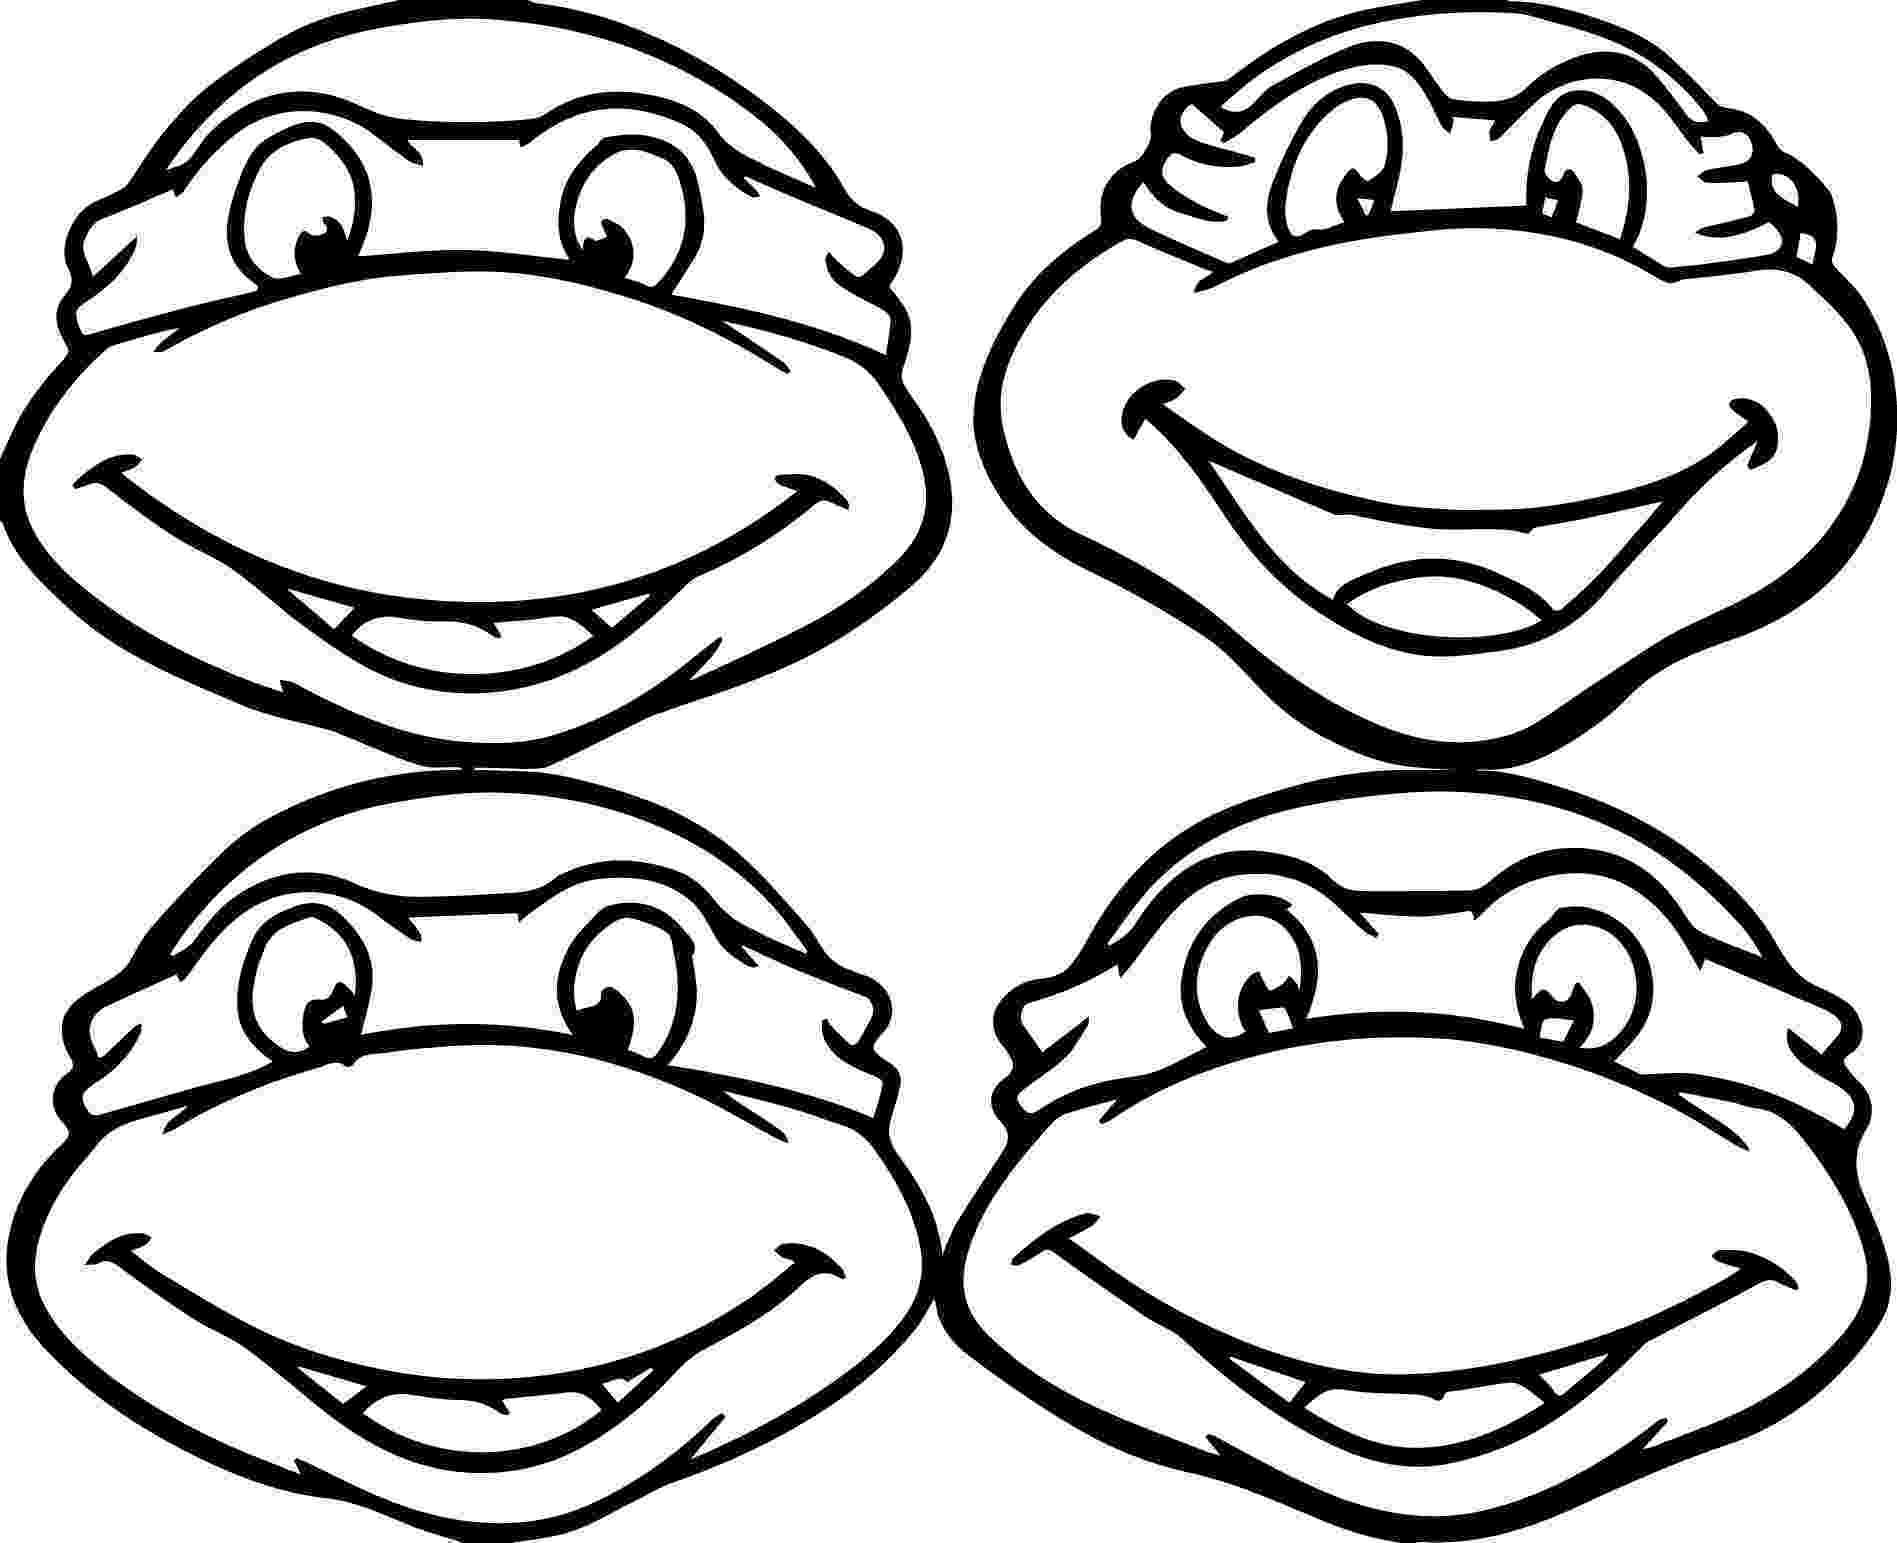 tmnt coloring pictures teenage mutant ninja turtles coloring pages best coloring pictures tmnt